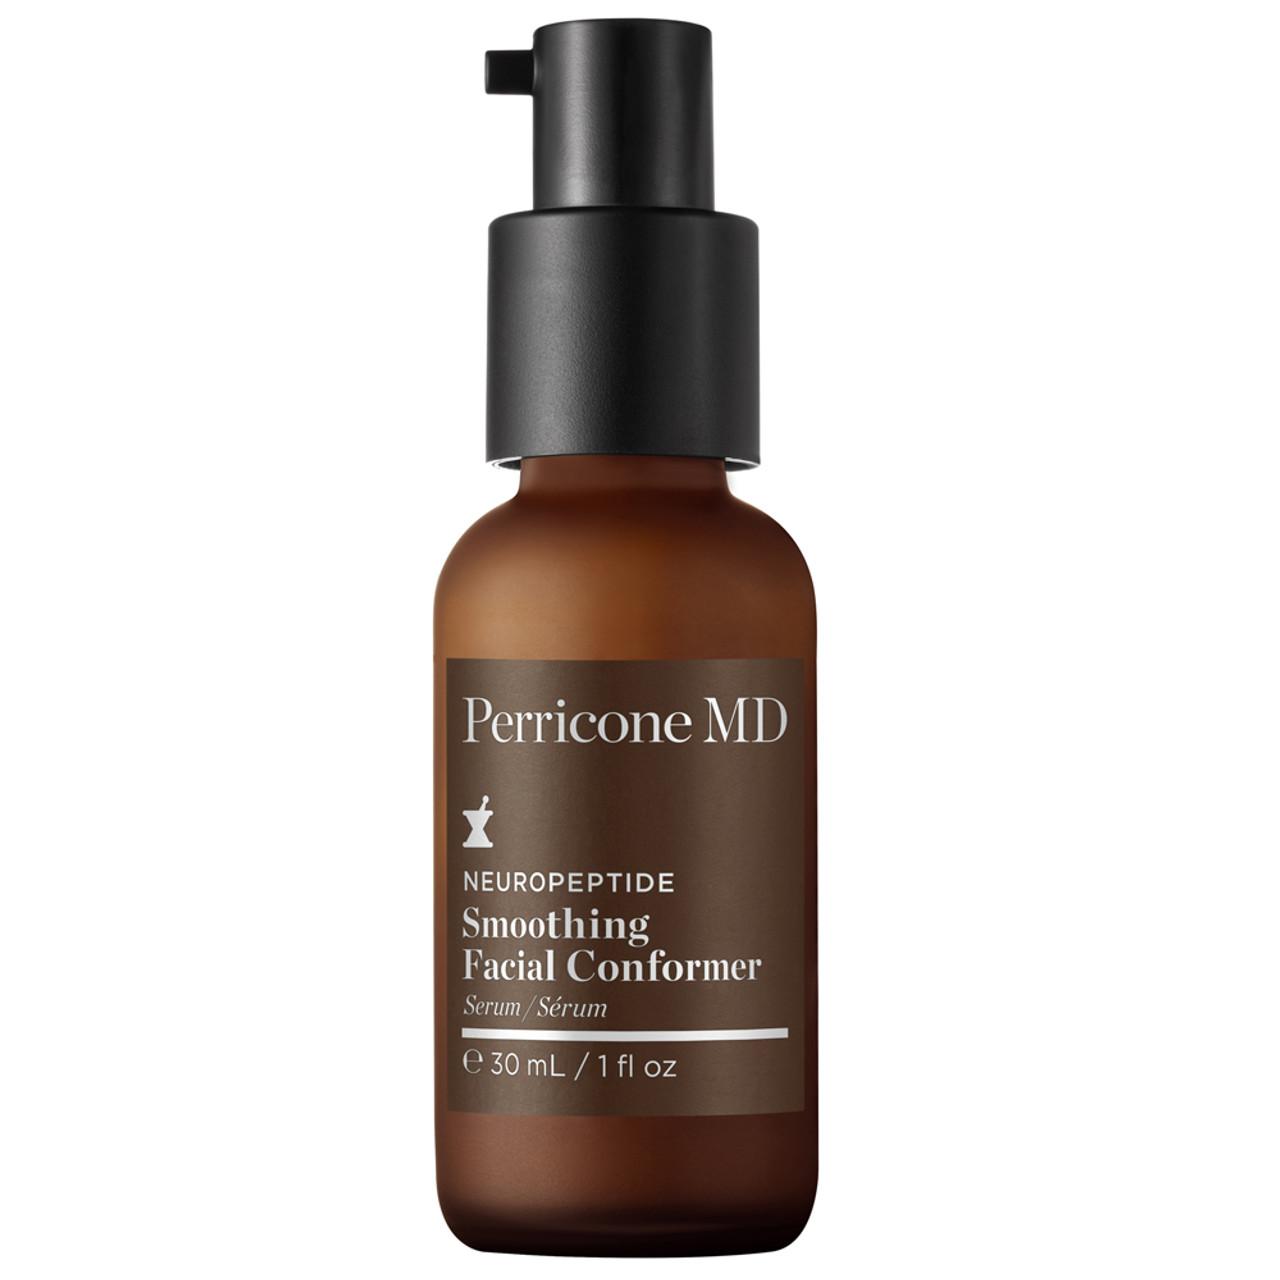 Perricone MD Neuropeptide Smoothing Facial Conformer BeautifiedYou.com